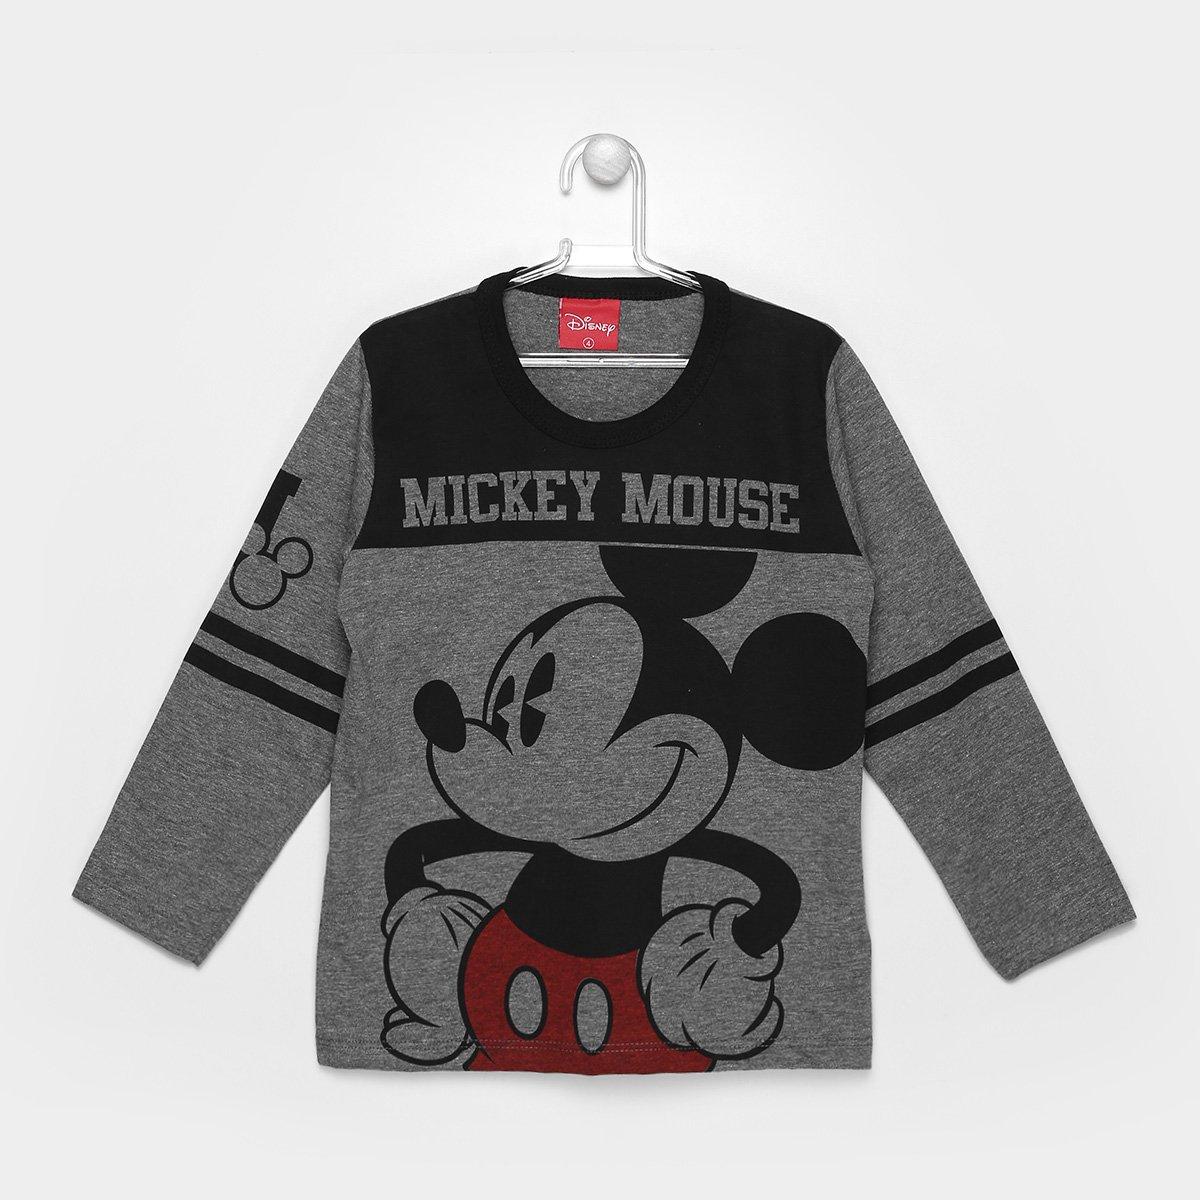 498bd5d51 Camiseta Infantil Kamylus Mickey Manga Longa Masculina - Compre Agora